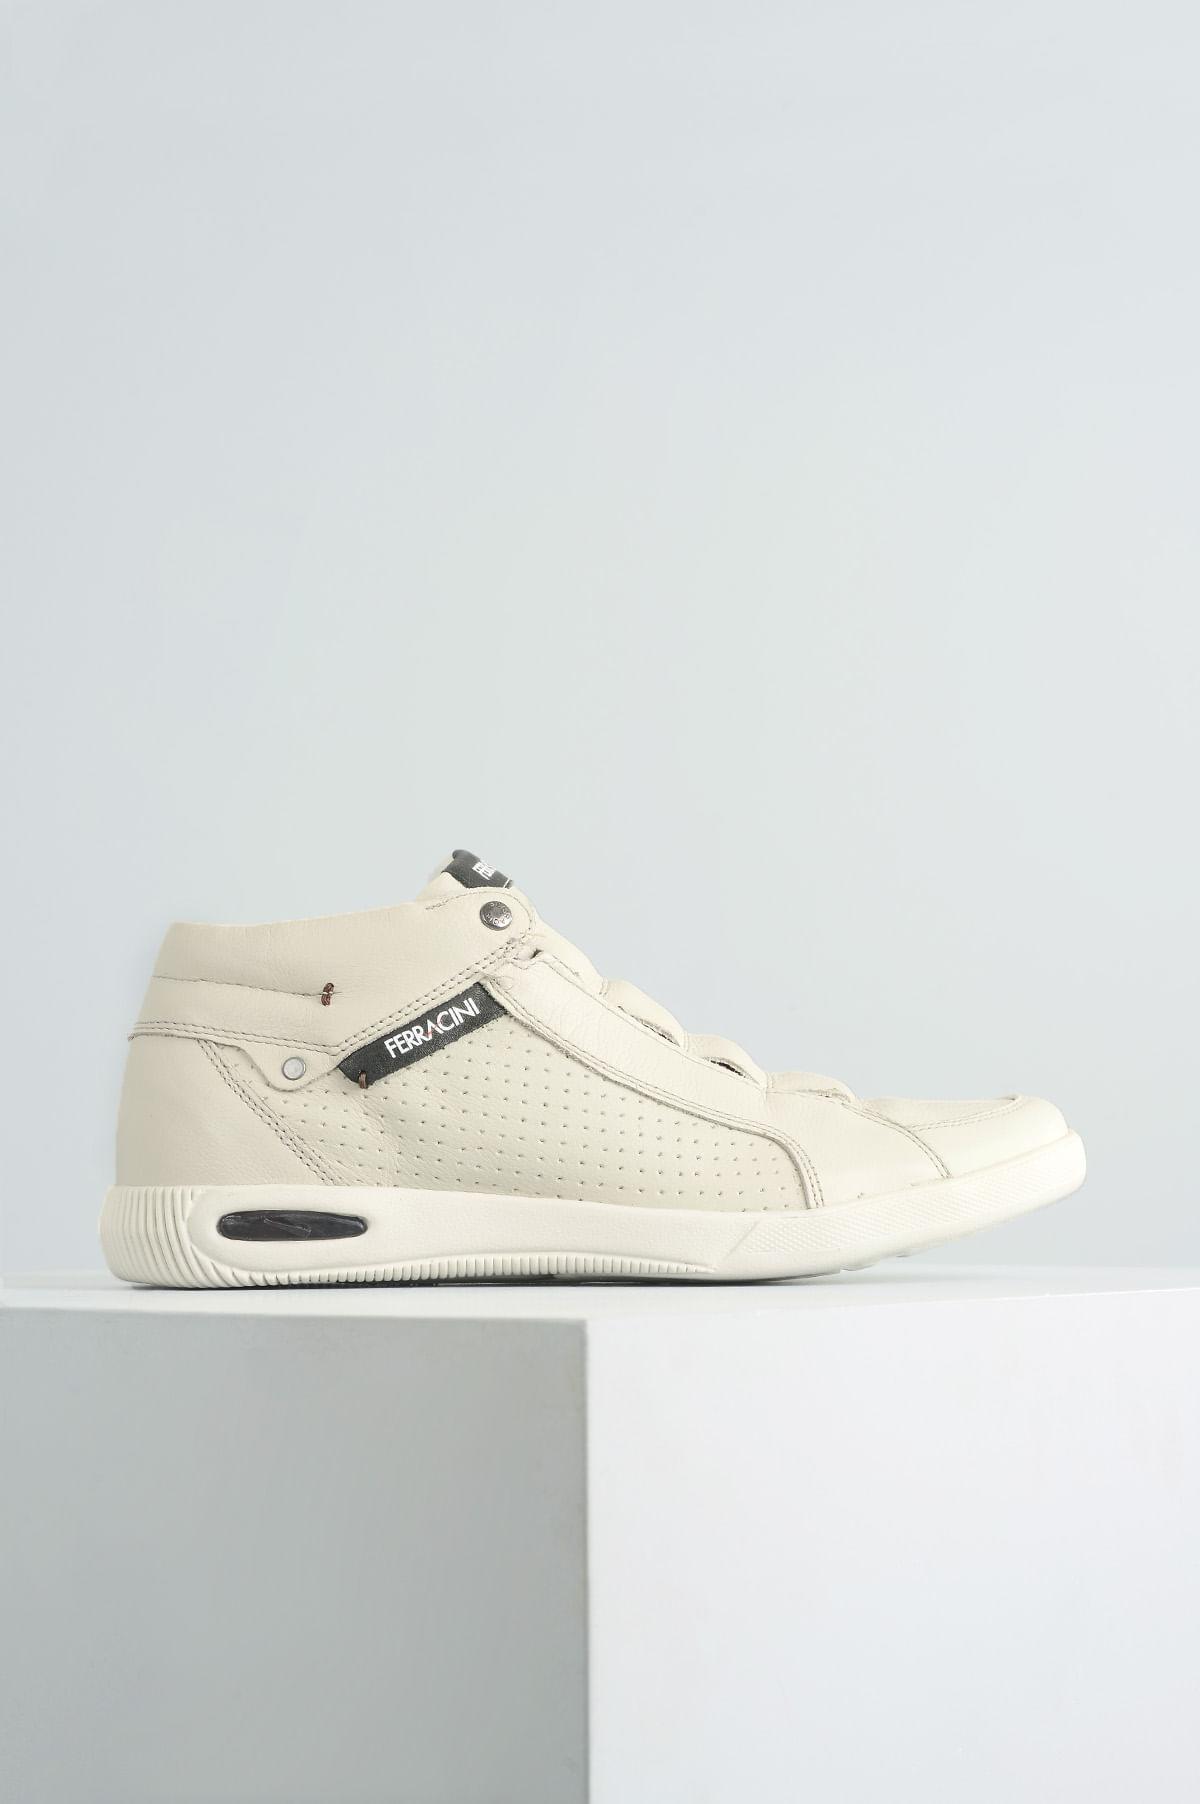 4d544a3b8 Sapatênis Masculino Ferracini Blady CR - OFF WHITE - Mundial Calçados